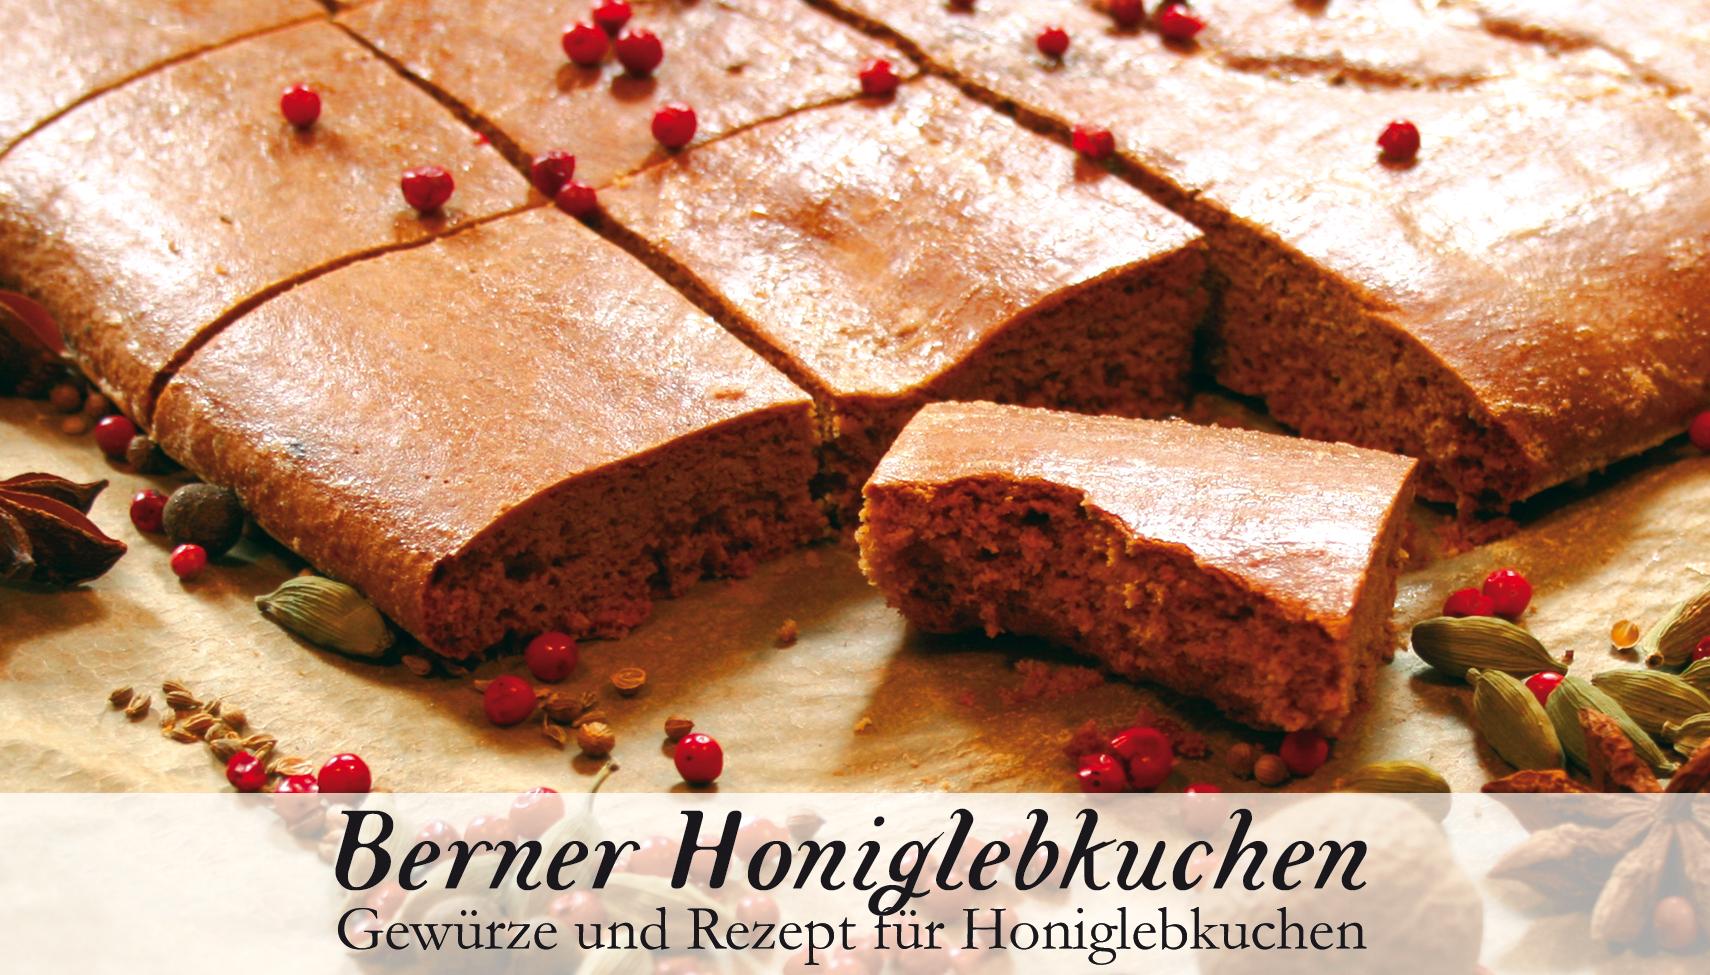 Berner Honiglebkuchen